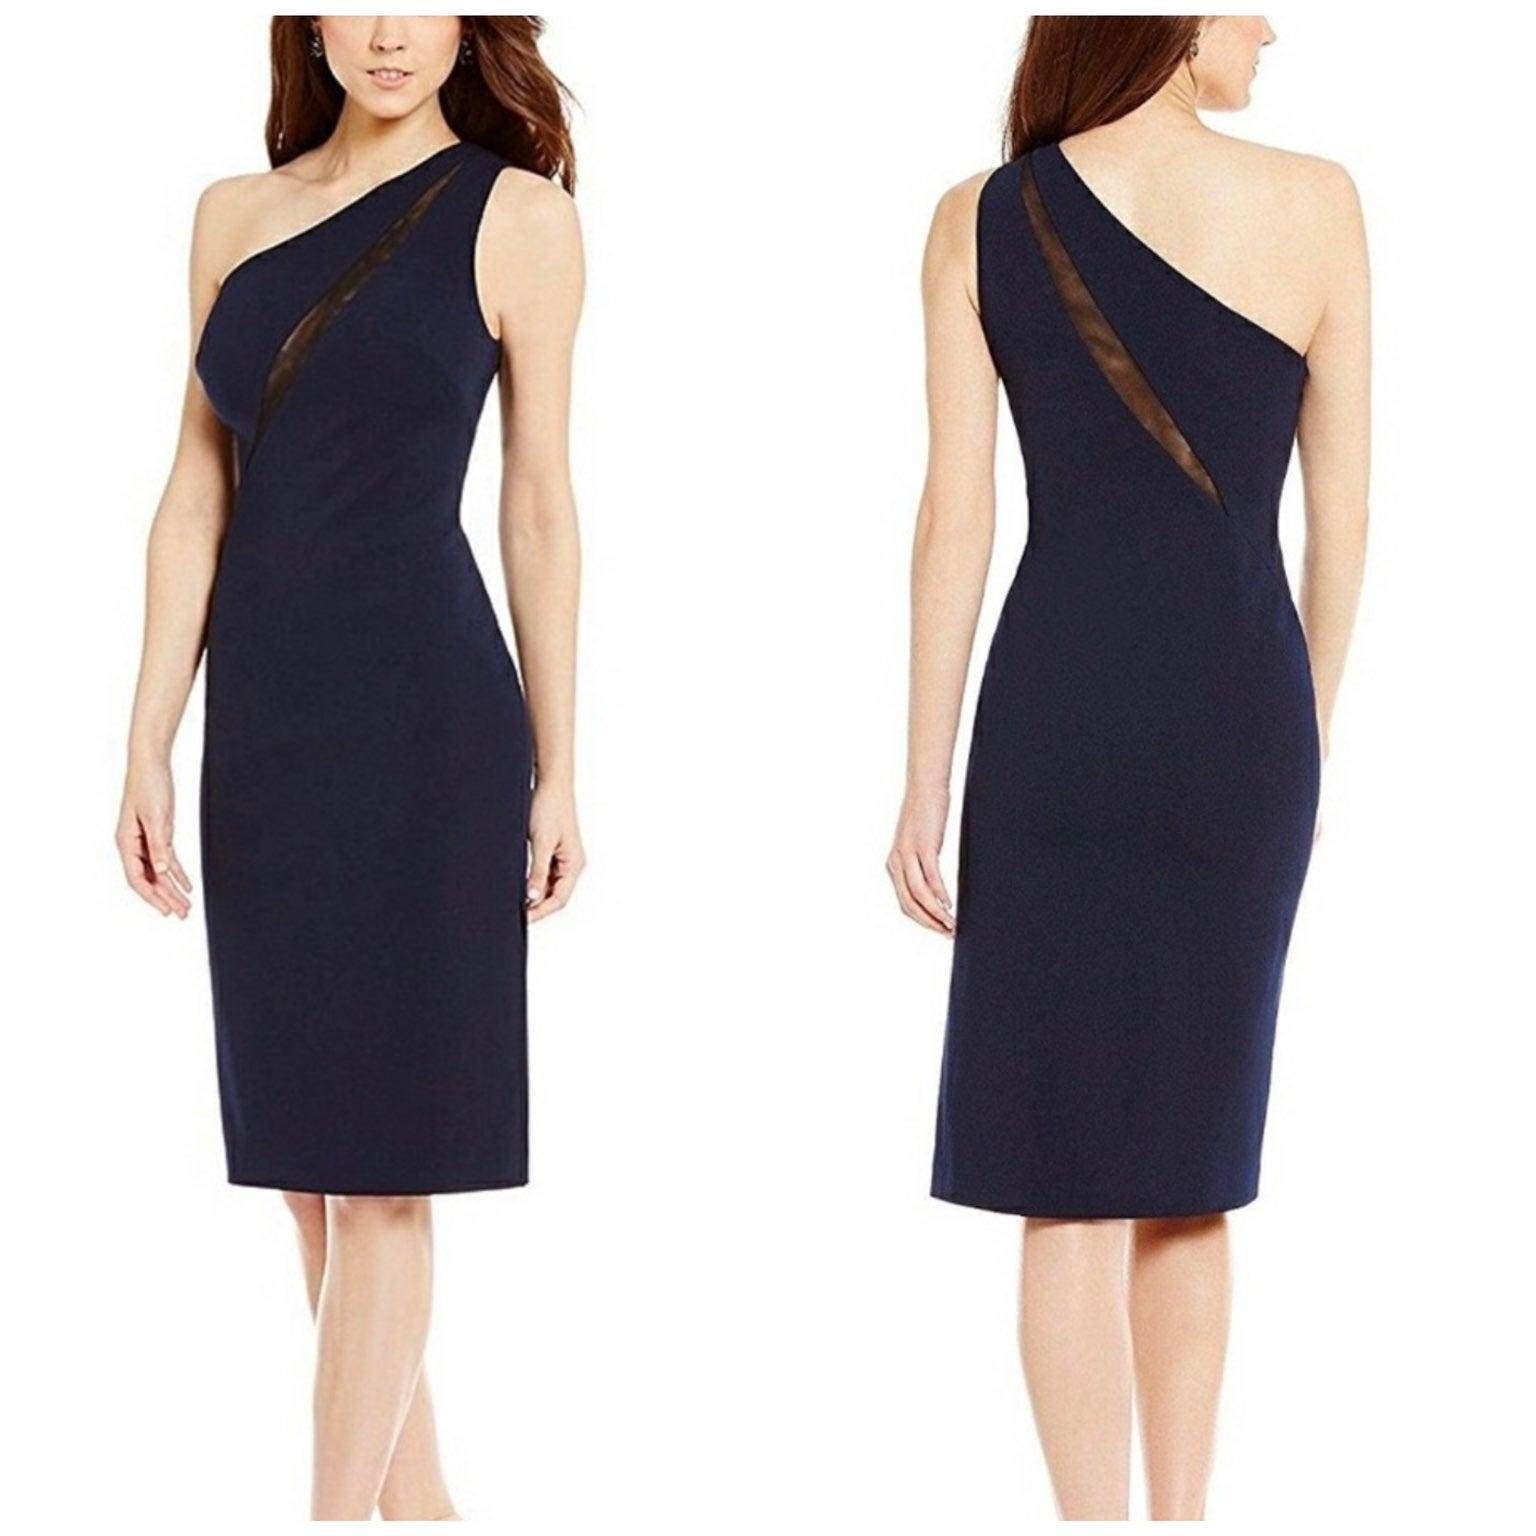 Antonio Melani Navy One Shoulder Dress